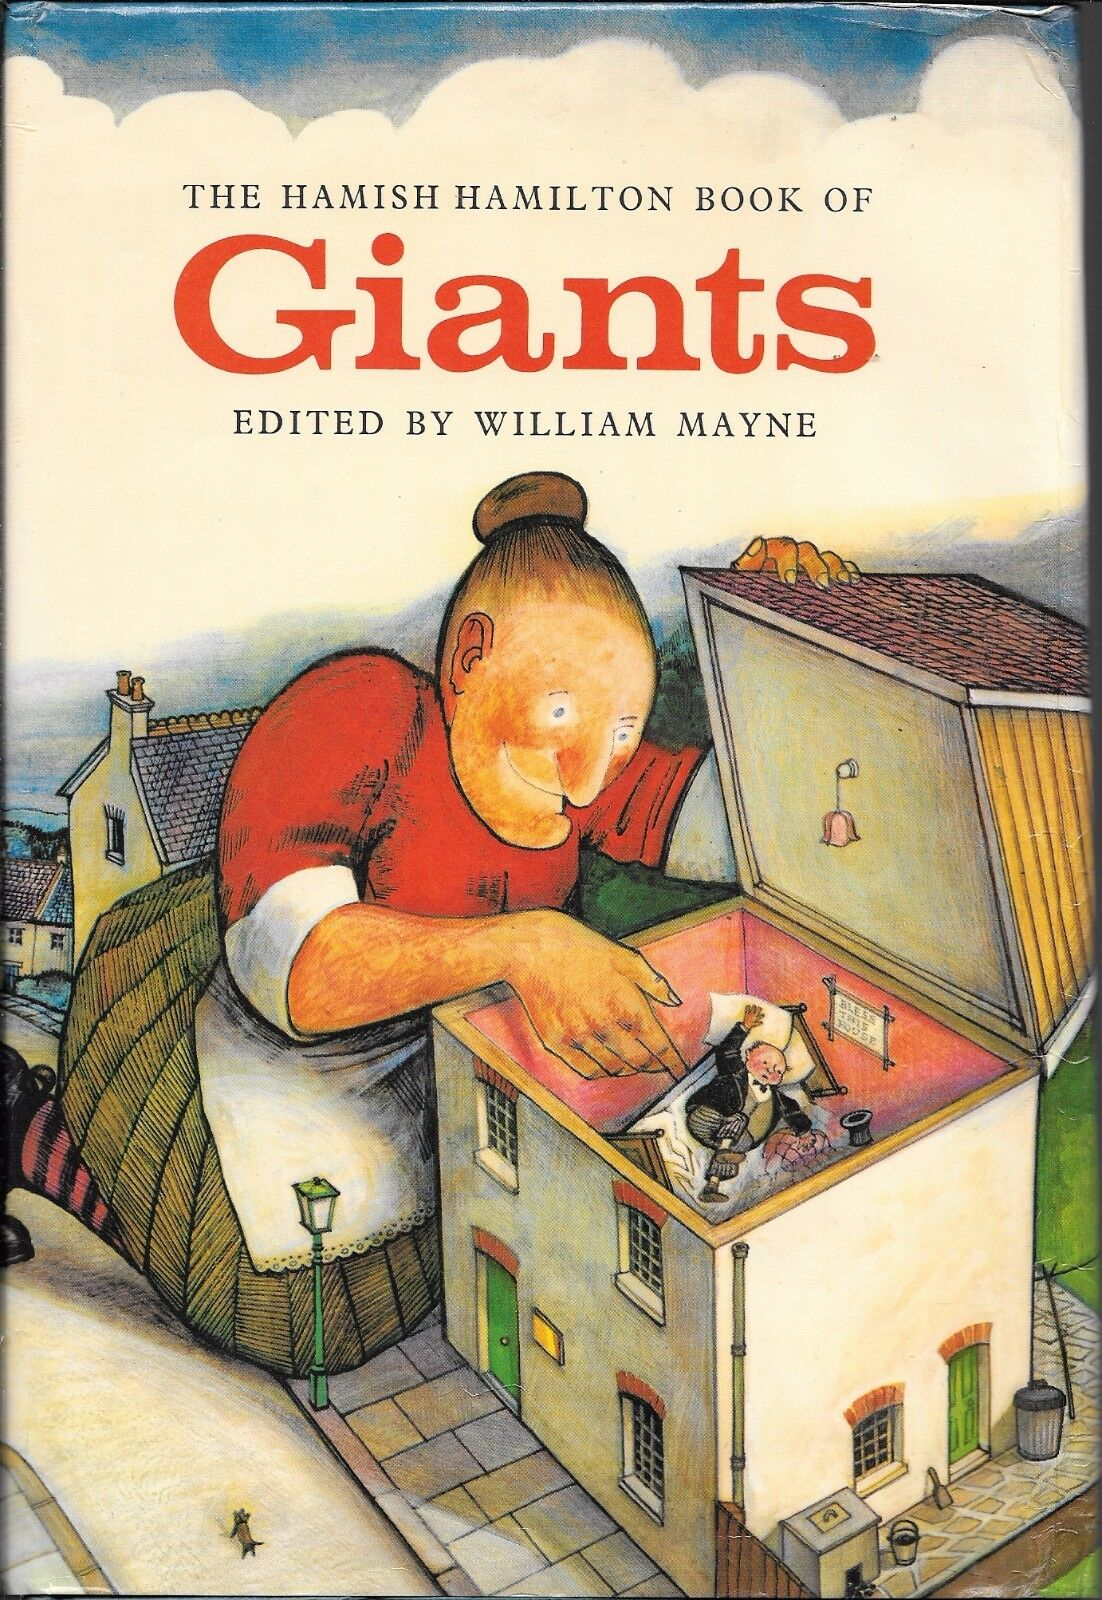 Hamish Hamilton Book of Giants William Mayne